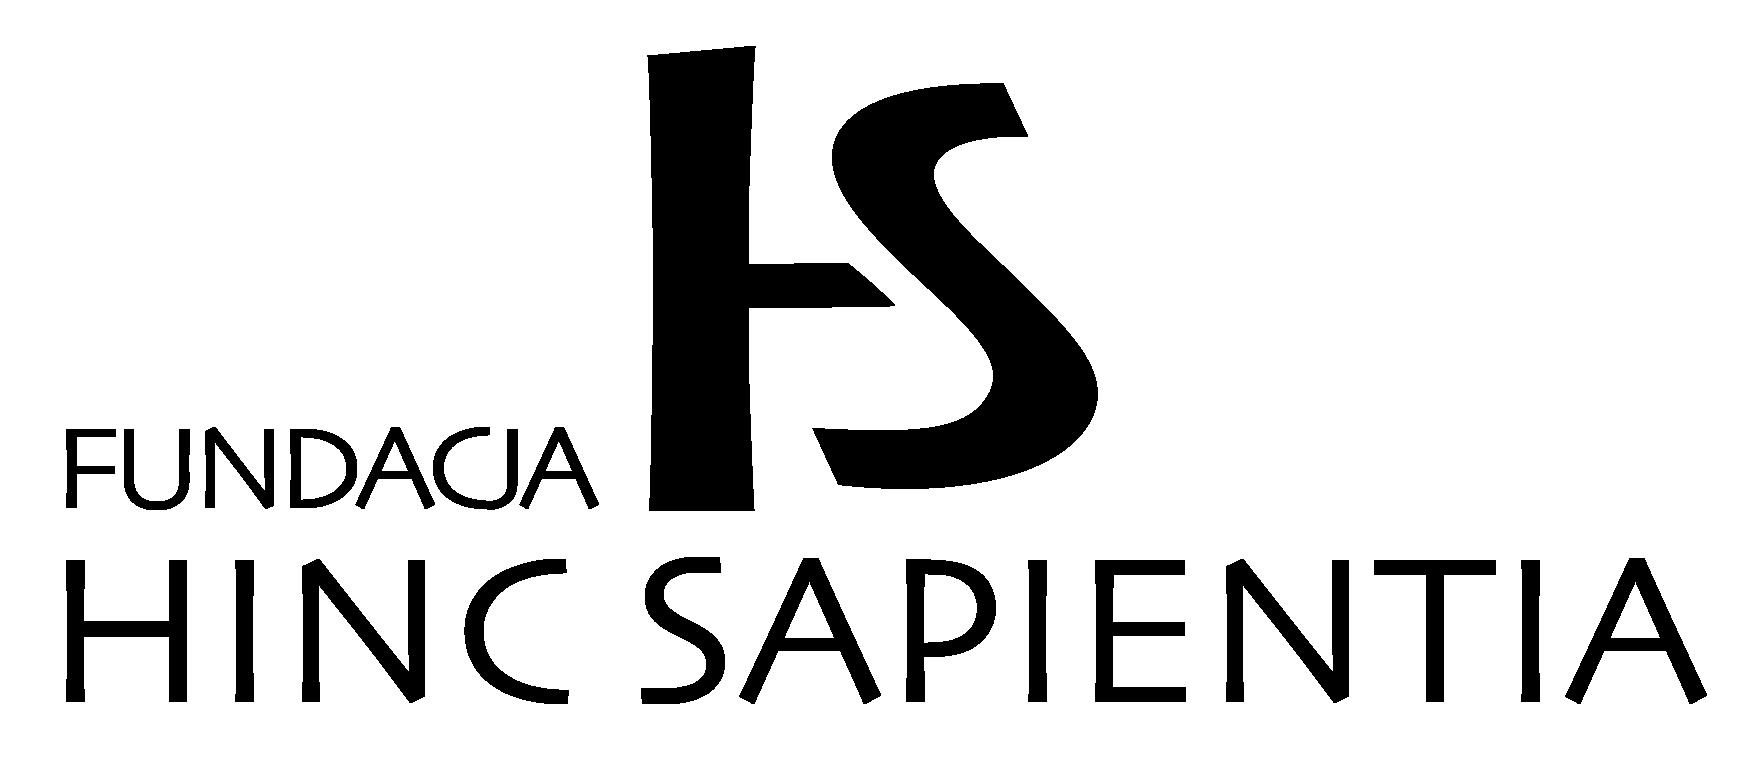 Fundqcja Hinc Sapientia